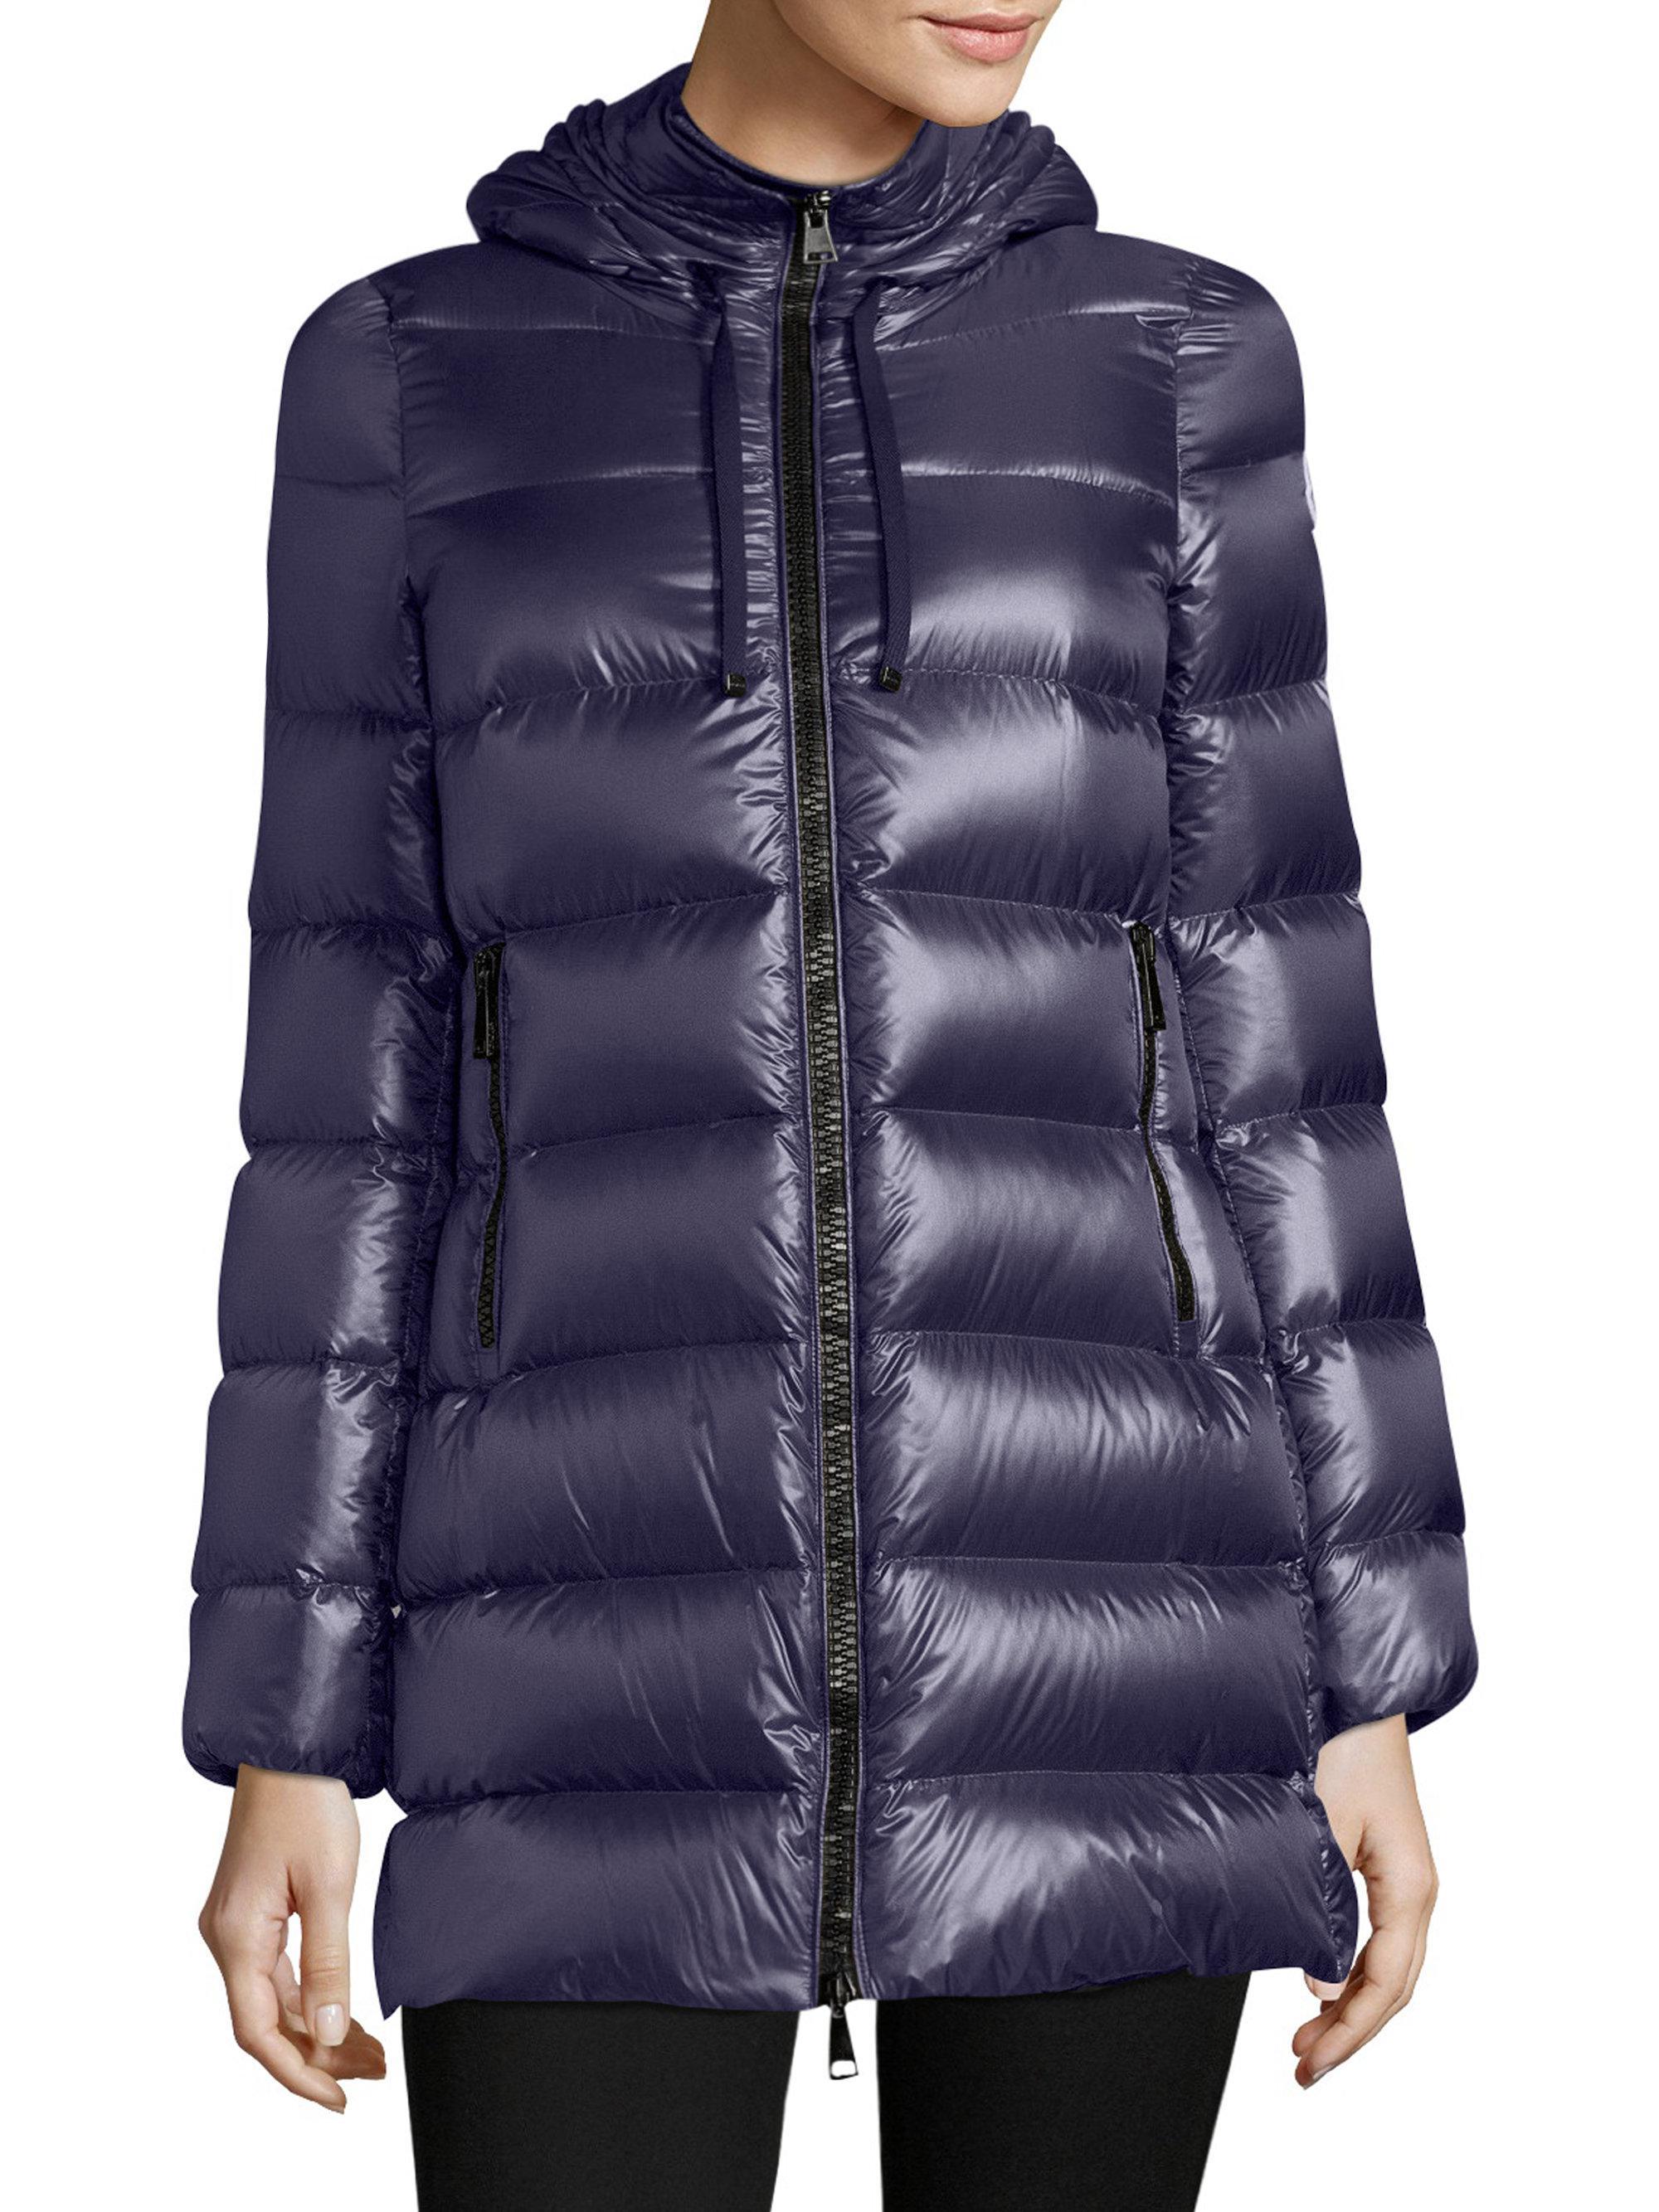 303e32a37617 official store moncler coat saks customer sevice aa5ec 06c70